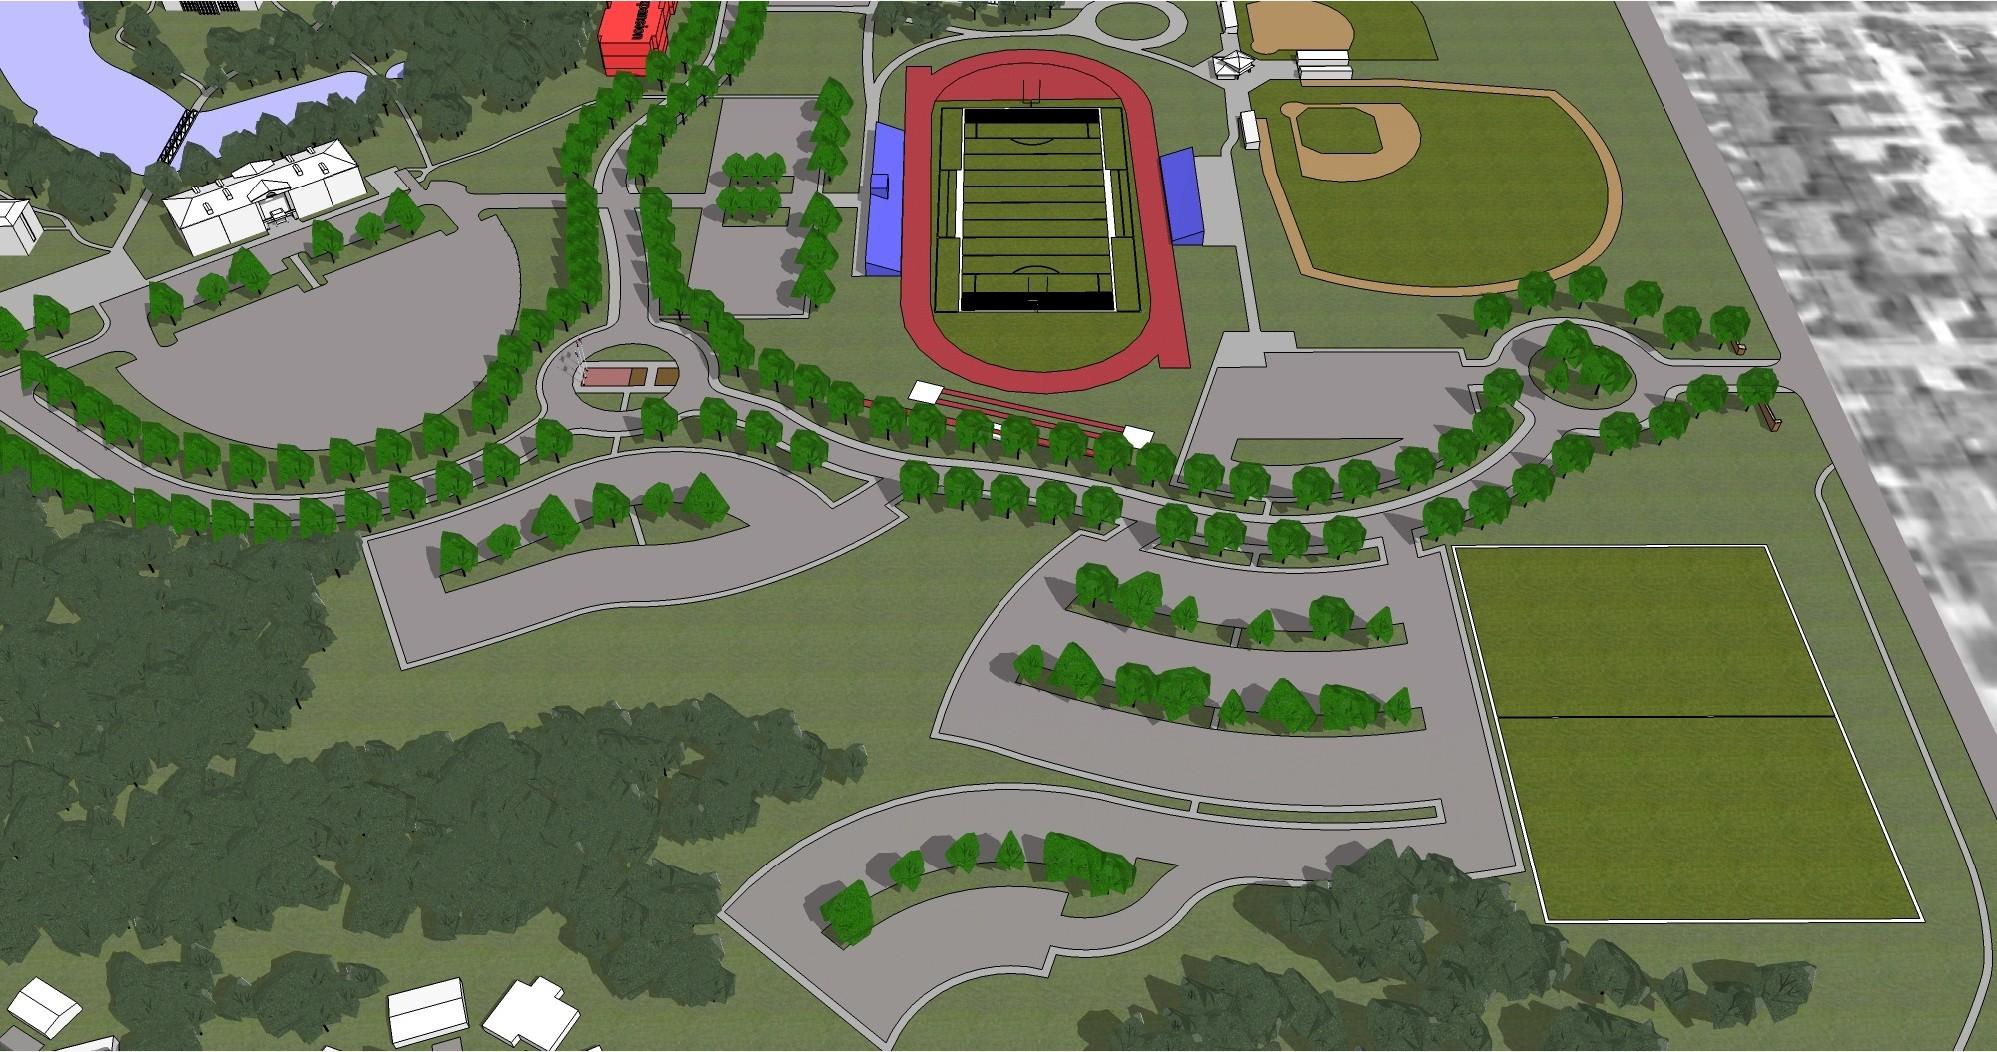 Athletics Zone Aerial View